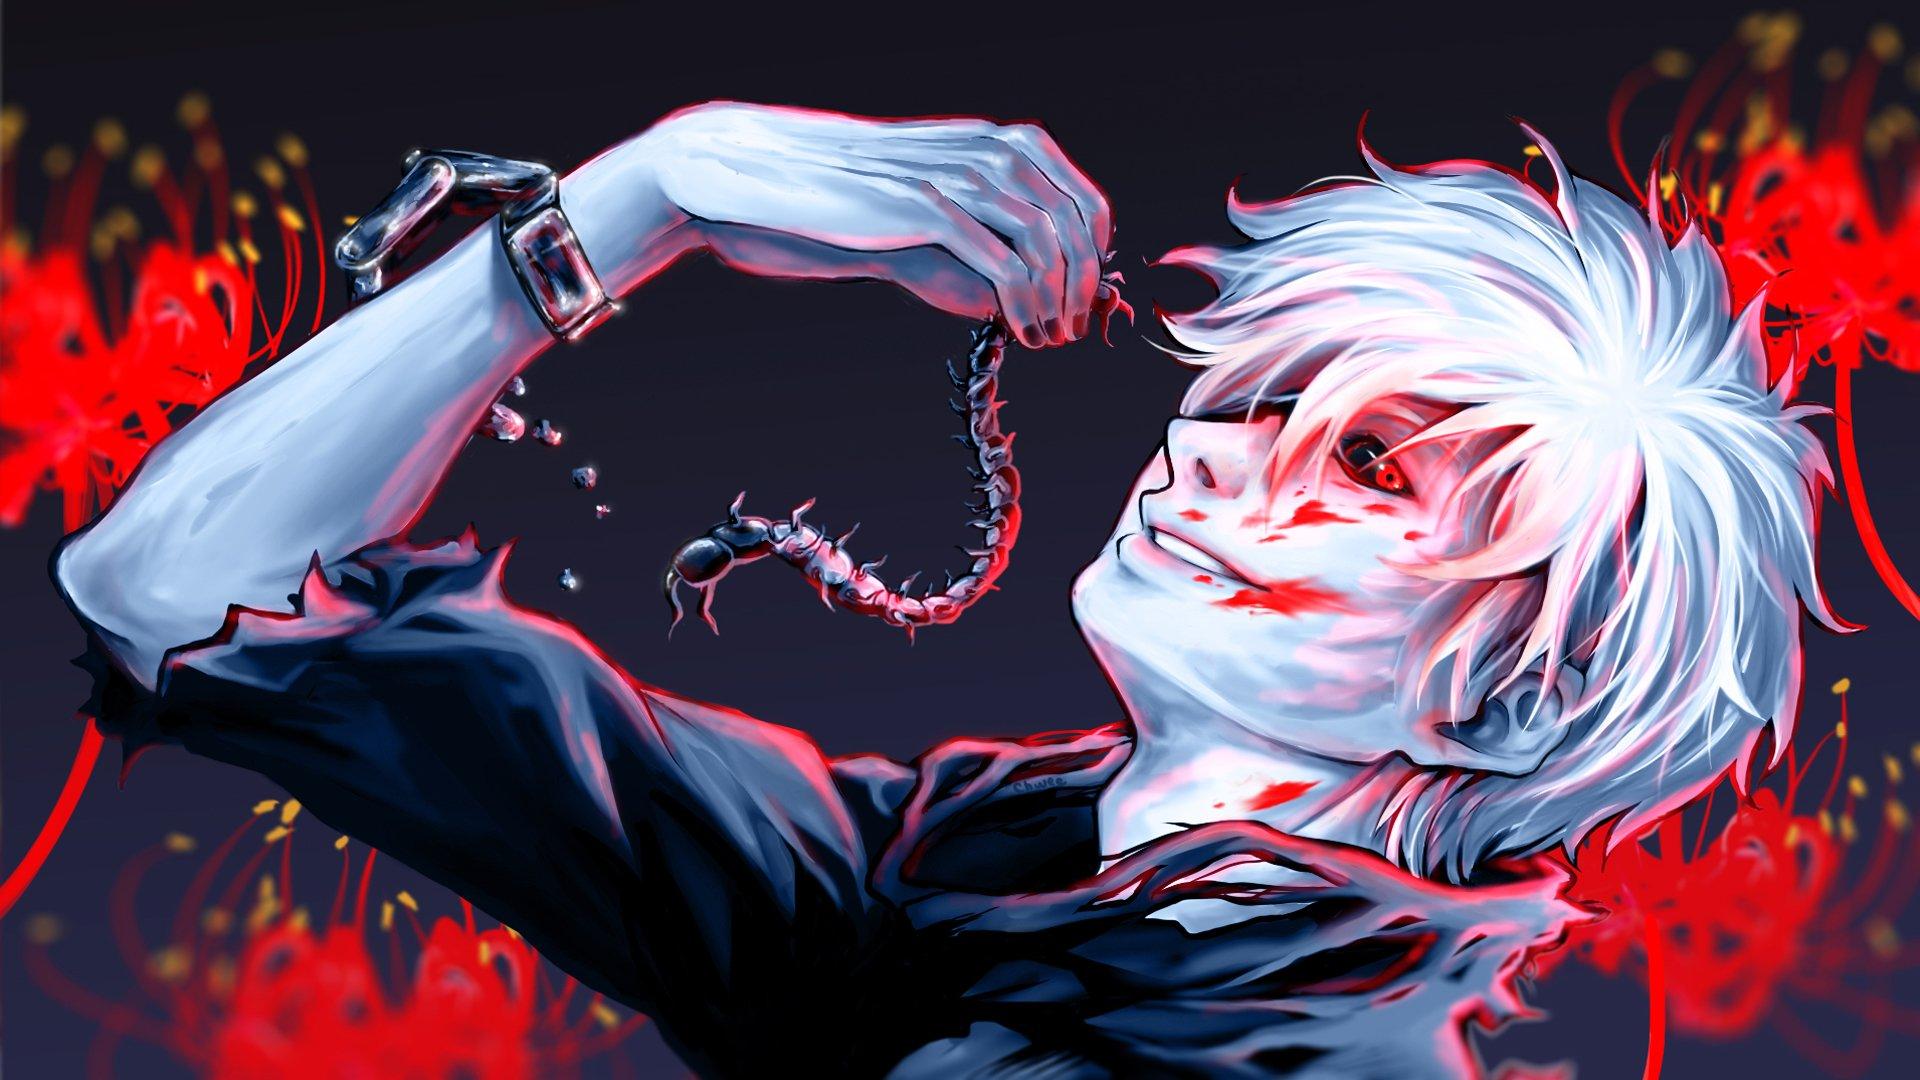 Hd wallpaper tokyo ghoul - Anime Tokyo Ghoul Ken Kaneki Wallpaper